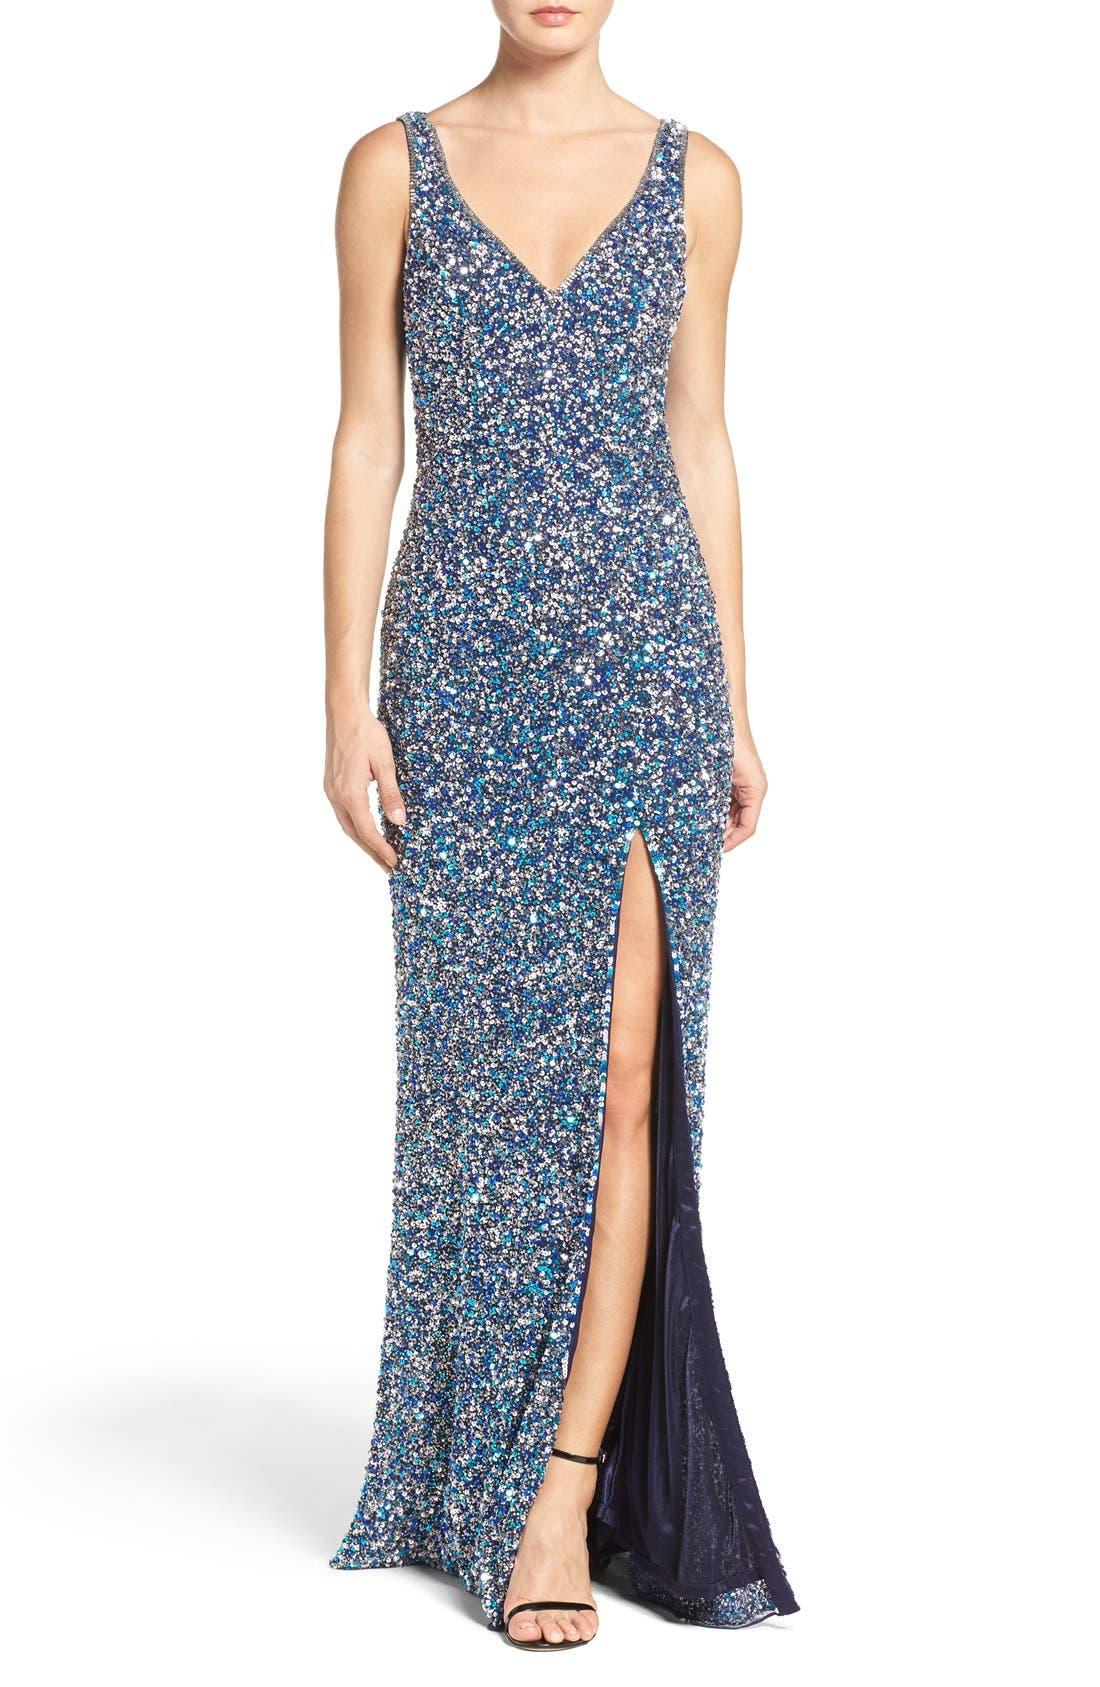 Alternate Image 1 Selected - Mac Duggal Sequin Slit Gown